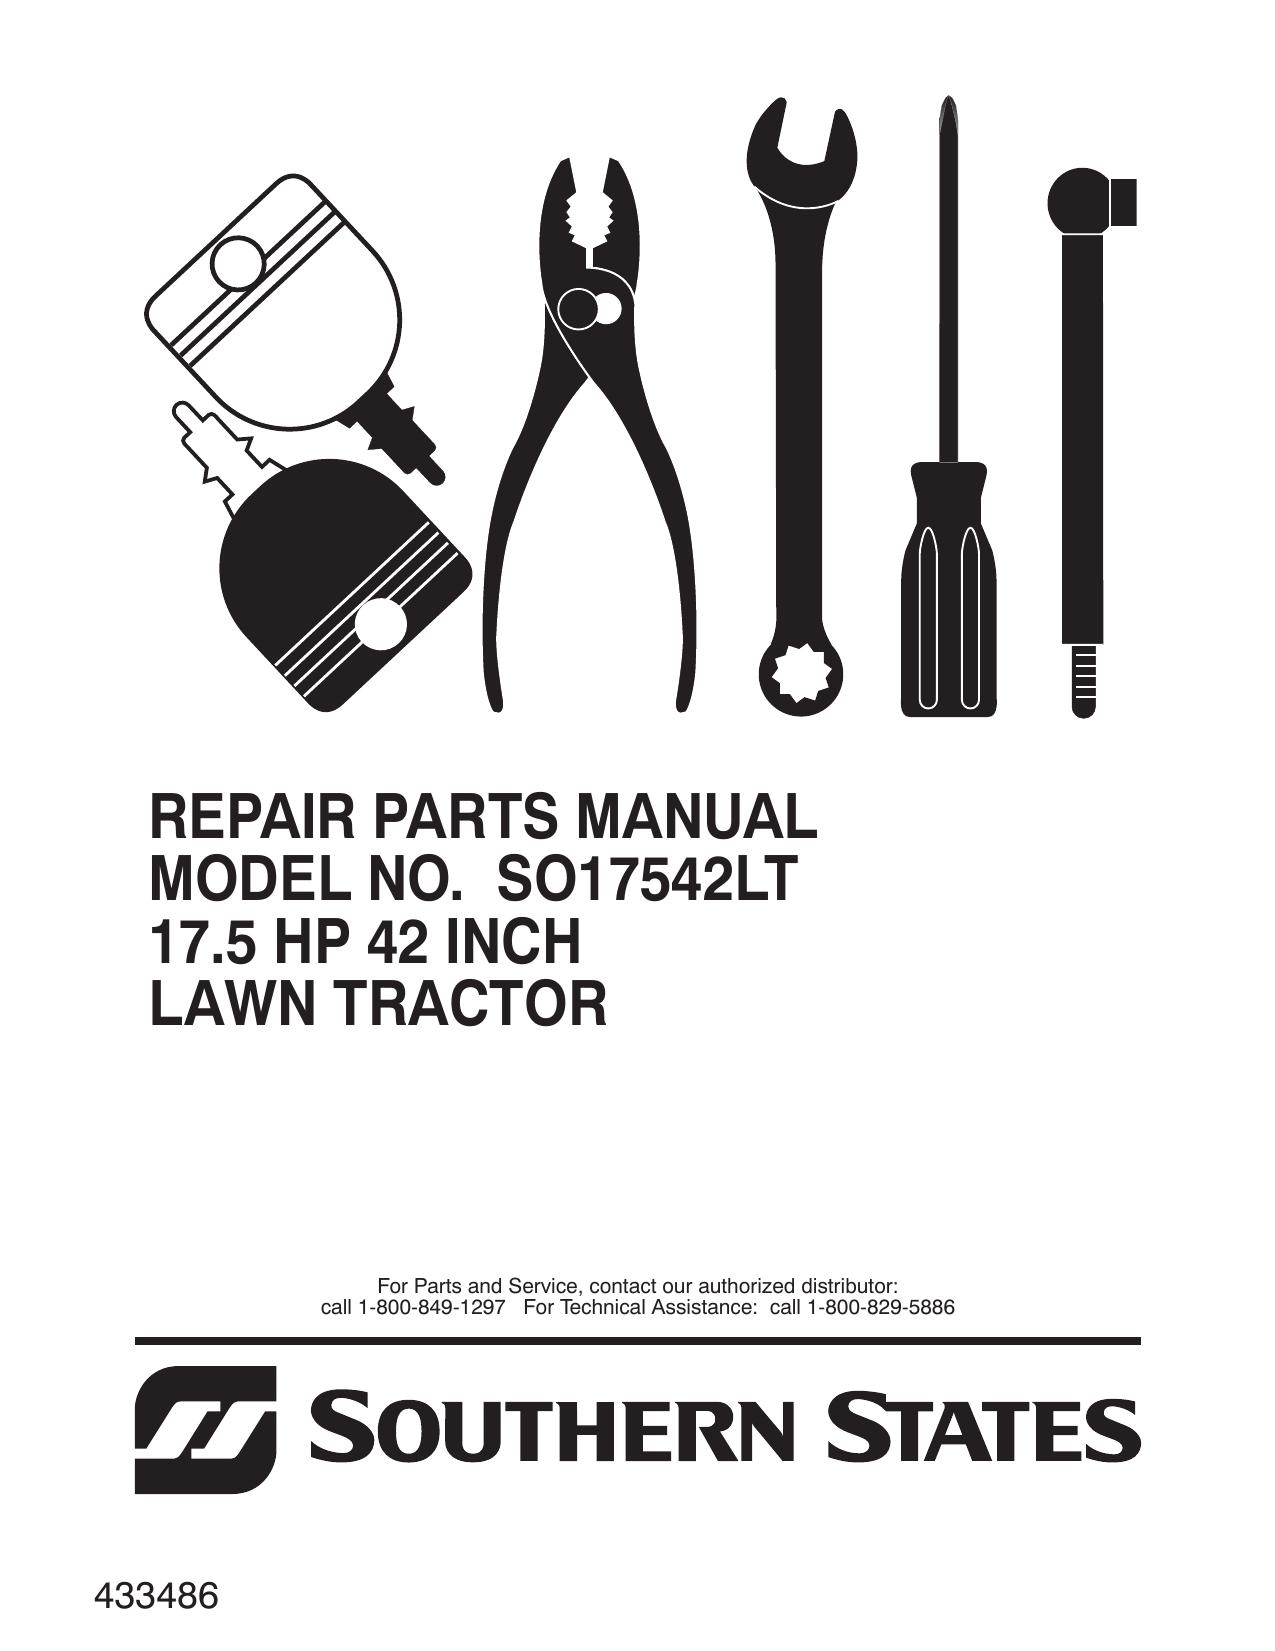 ... Array - repair parts manual model no so17542lt 17 5 hp 42 inch lawn  tractor rh